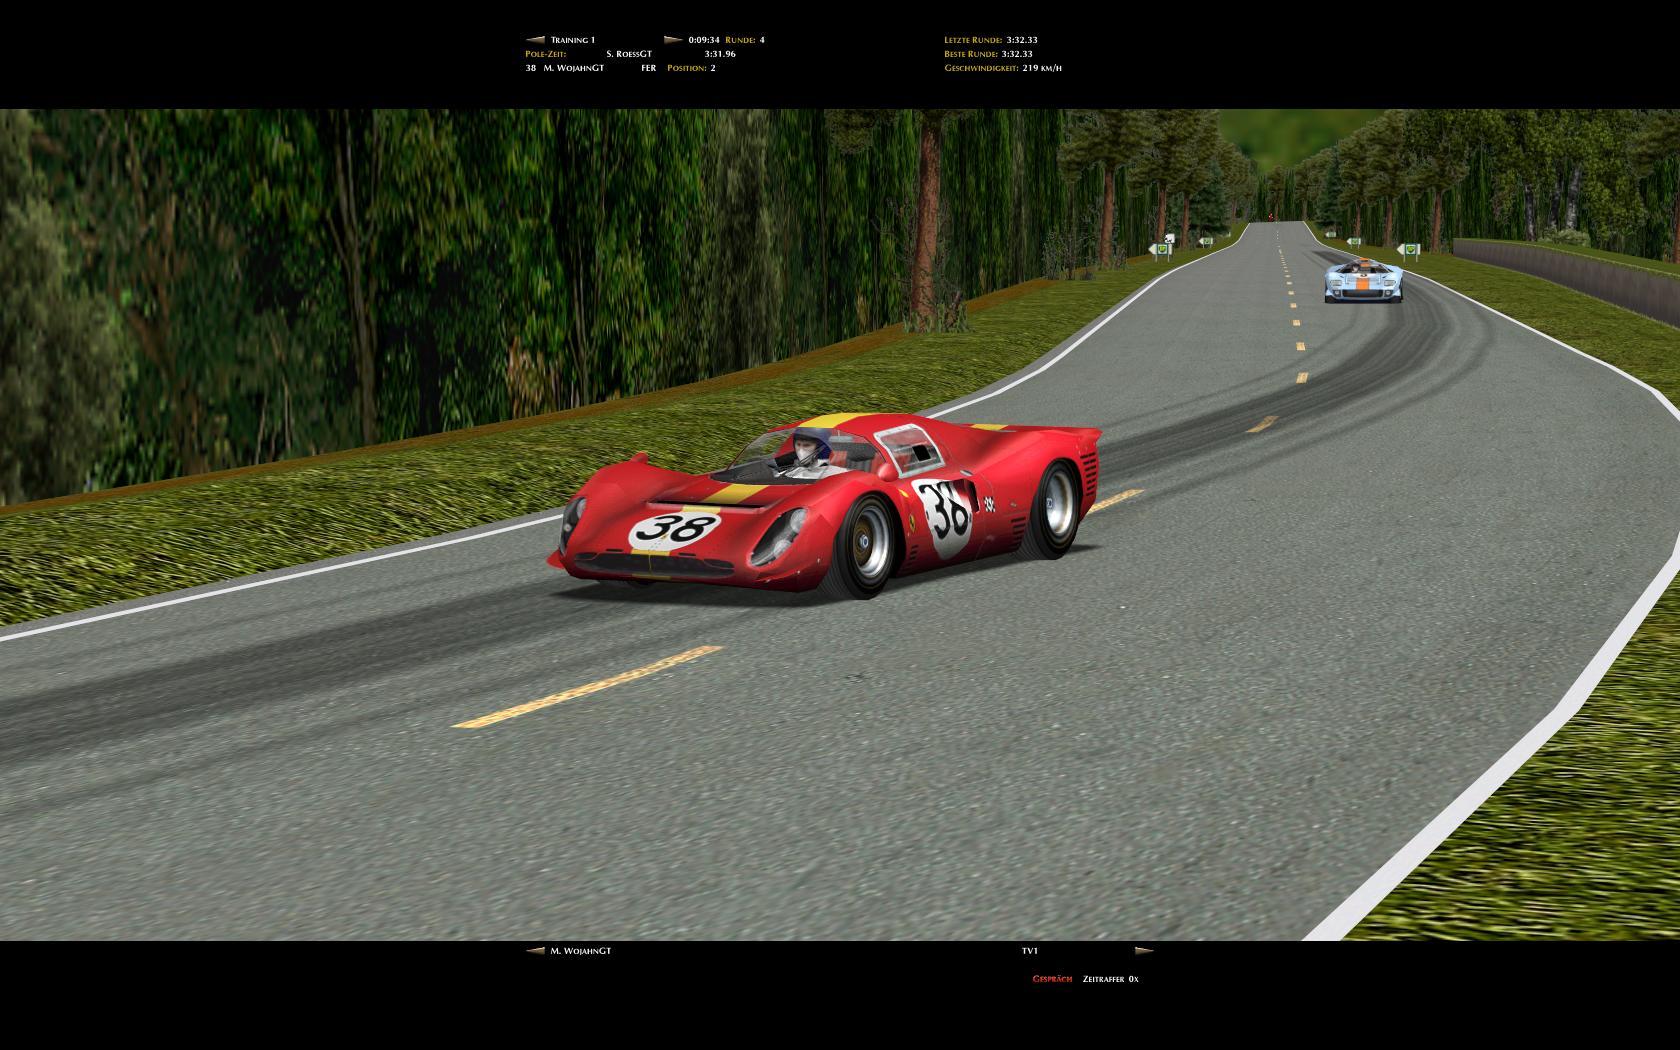 grand prix legends 1967 sports car mod released sim racing news. Black Bedroom Furniture Sets. Home Design Ideas